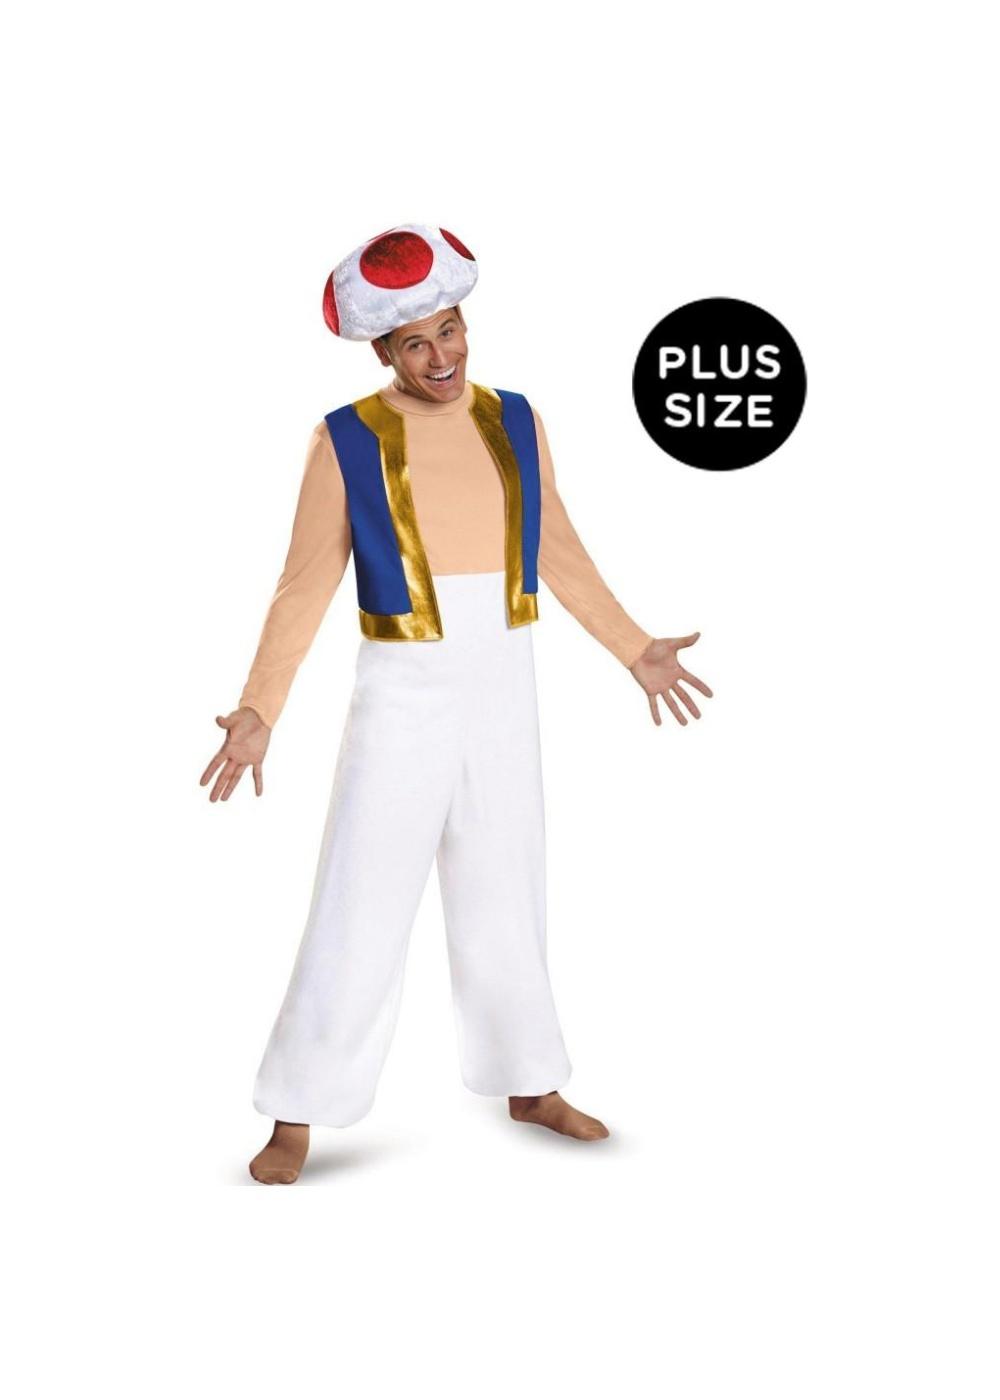 Plus Size Adult Halloween Costumes